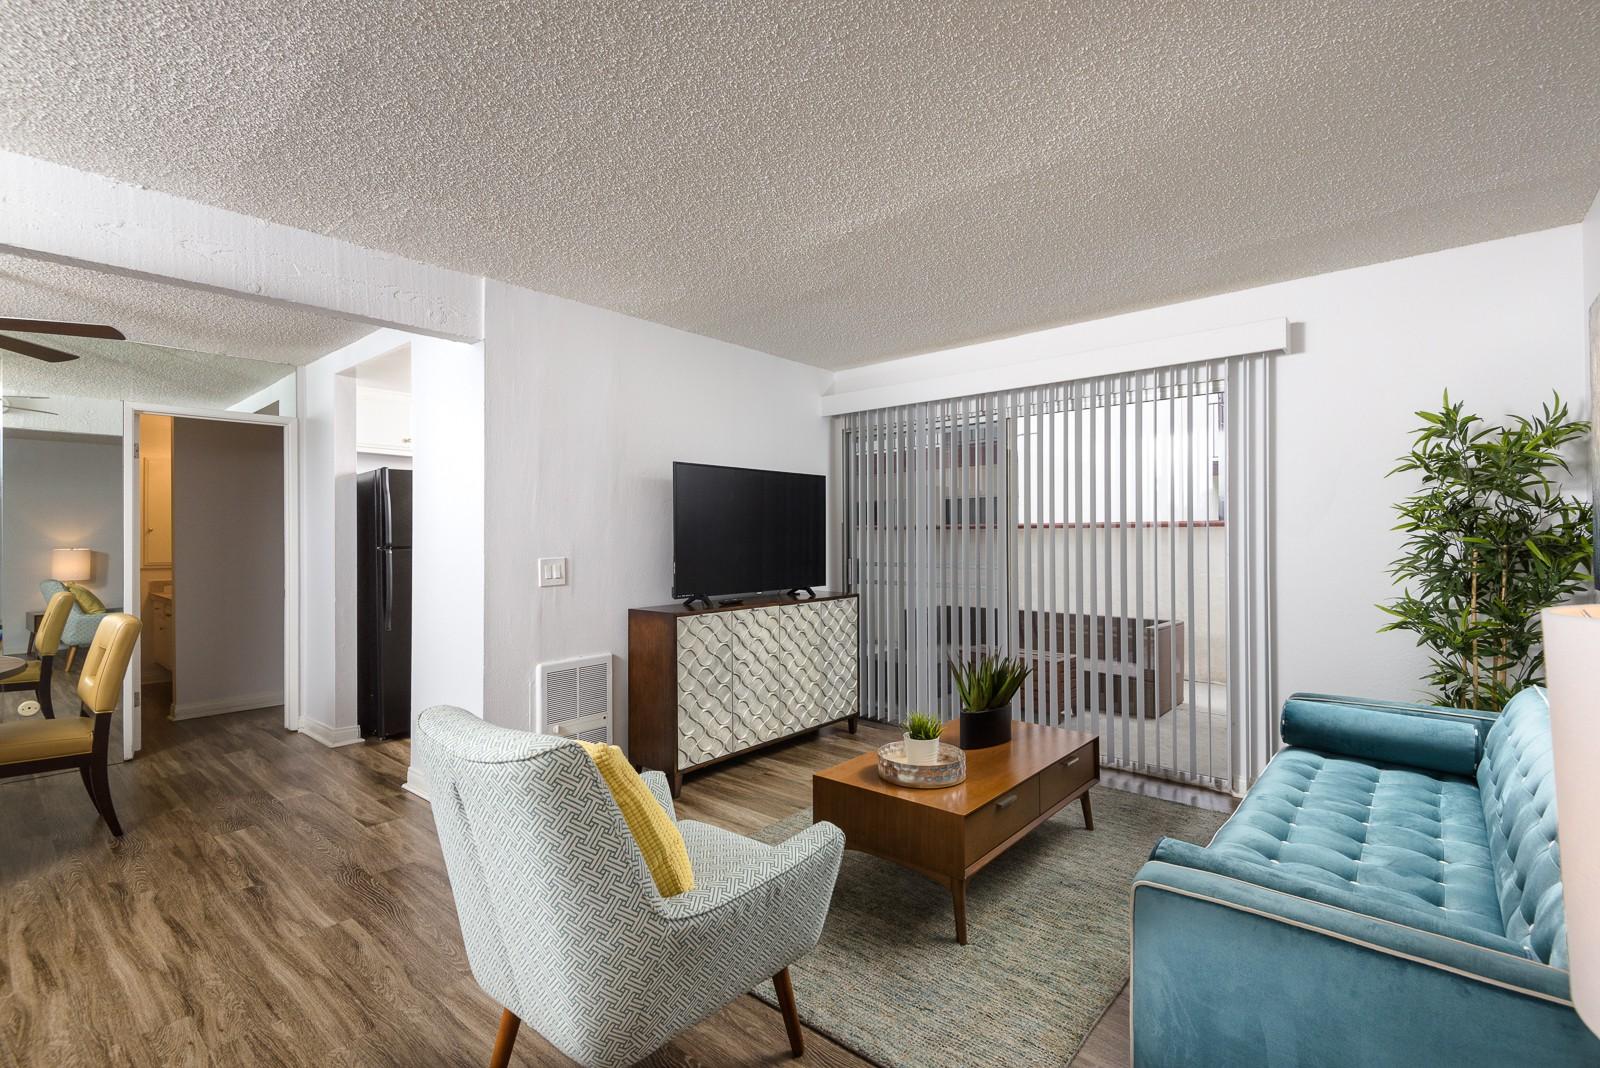 Apartments Near CSUDH El Cordova Apartments for California State University-Dominguez Hills Students in Carson, CA